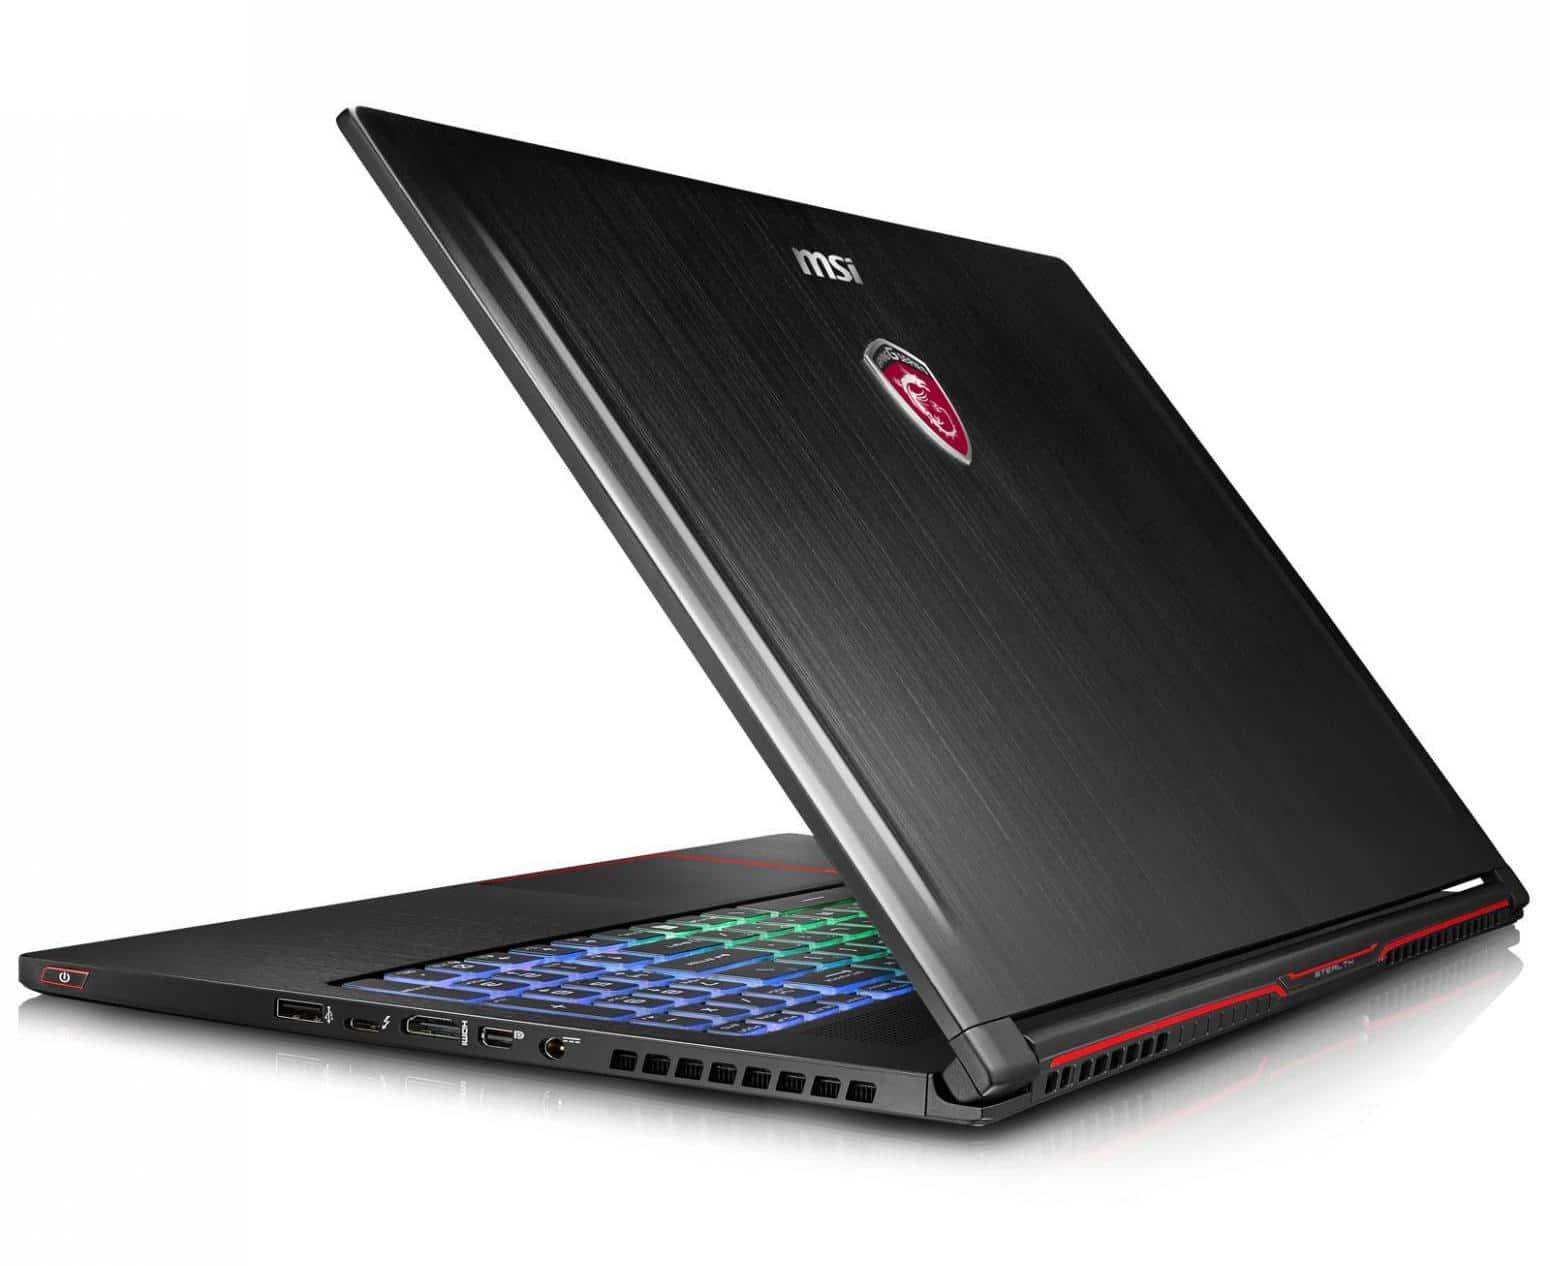 MSI GS63VR 6RF-089, ultrabook 15 pouces 4K GTX 1060 SSD 512+2To à 2199€